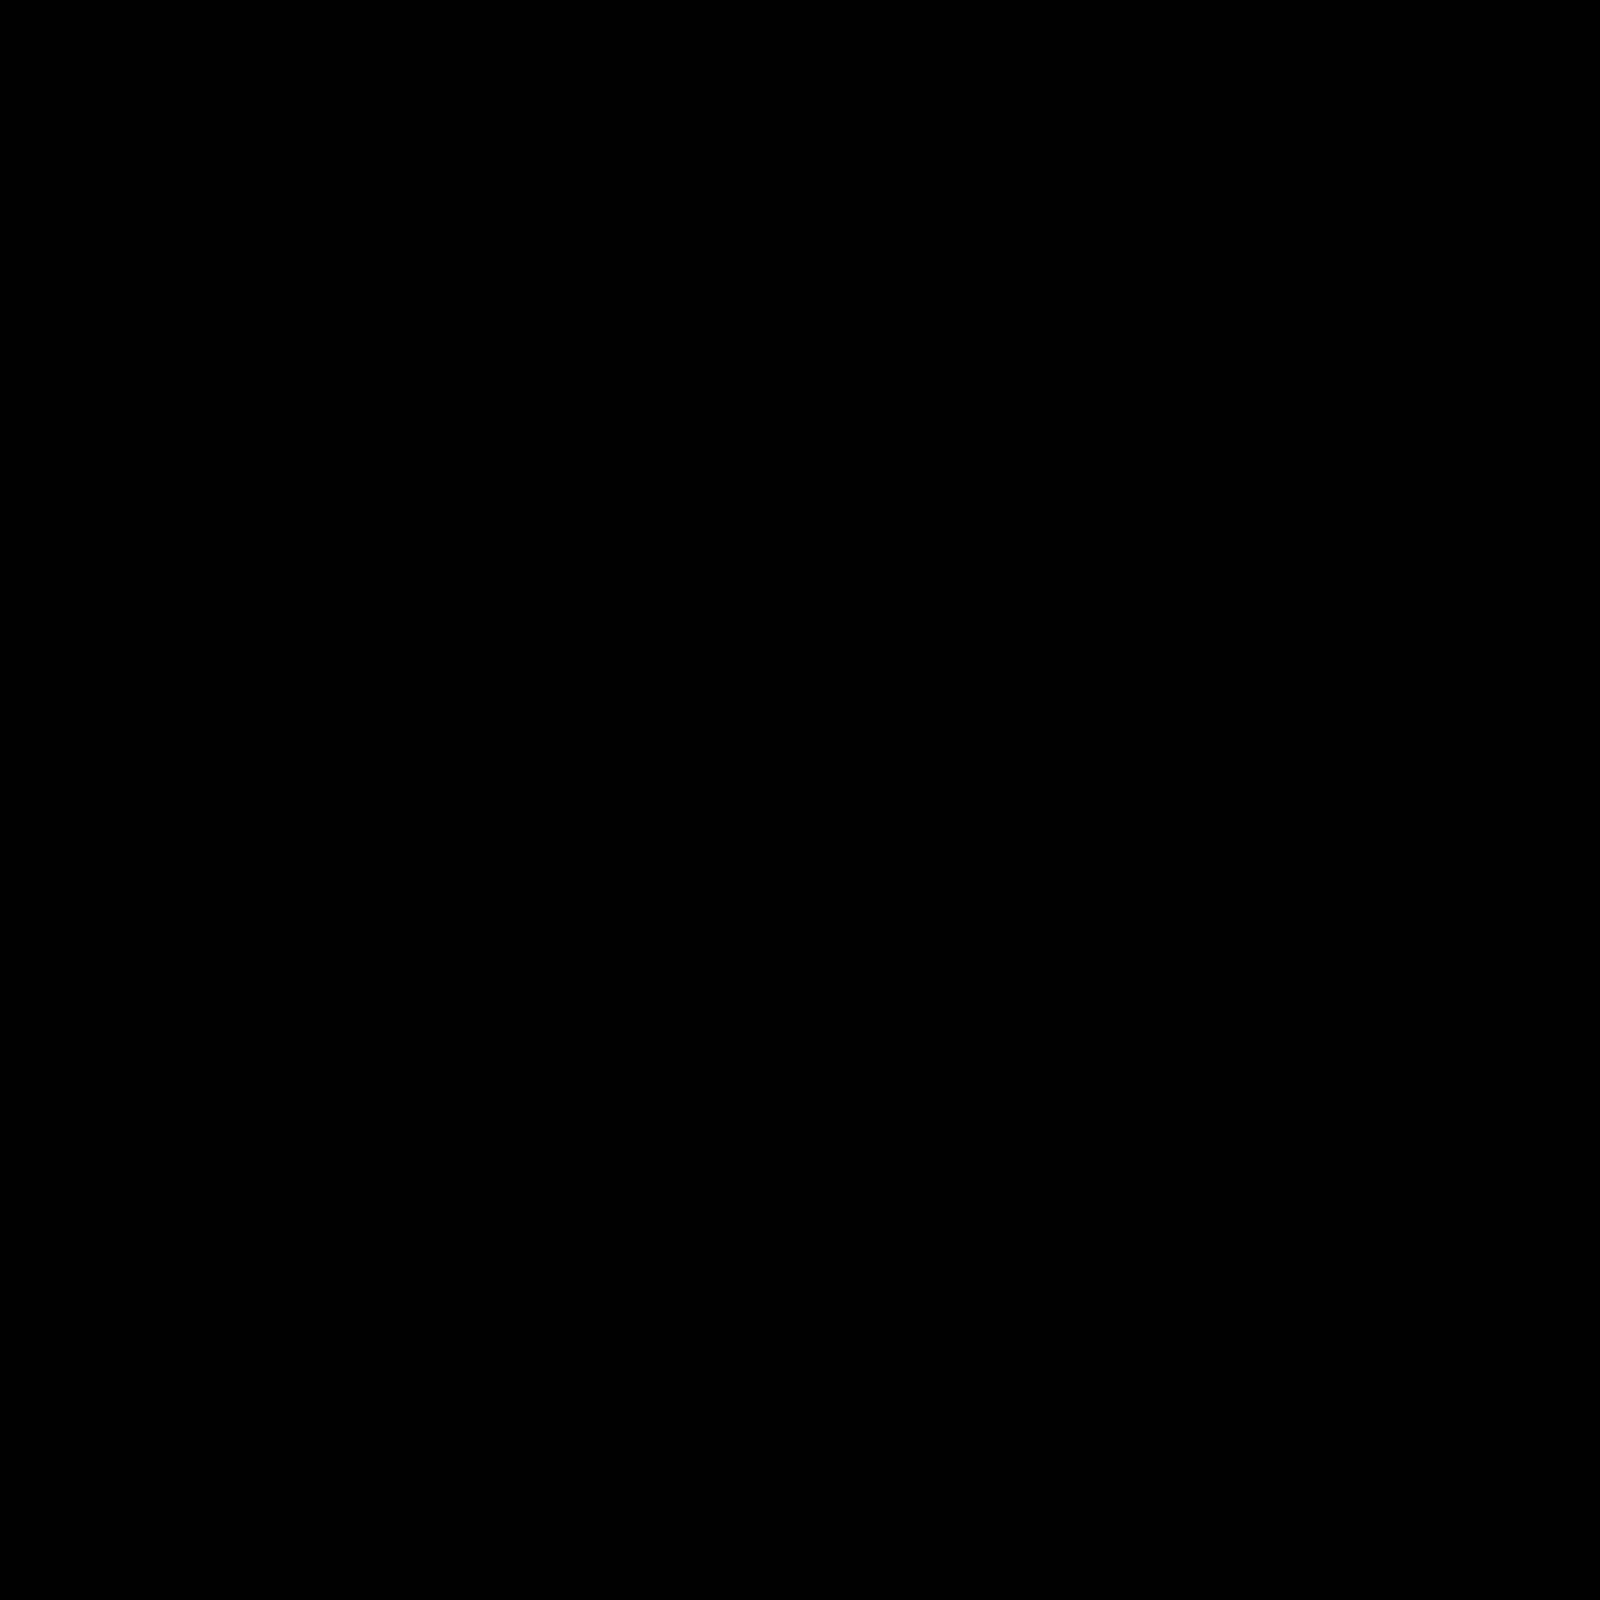 Filled Circle icon